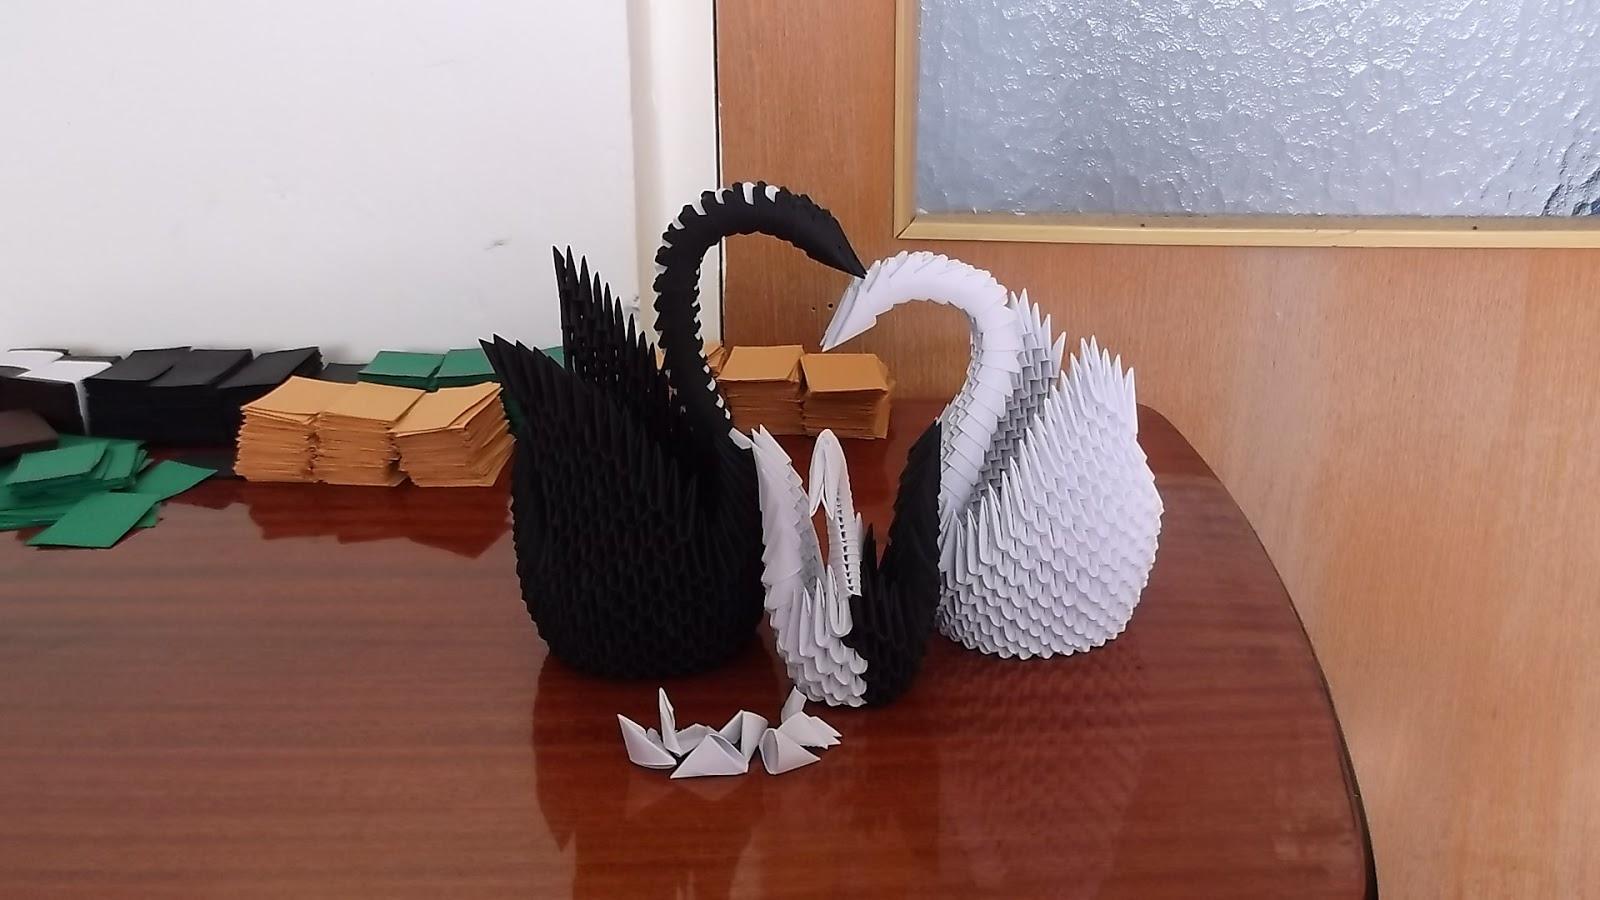 Razcapapercraft 3D Origami Swan Family